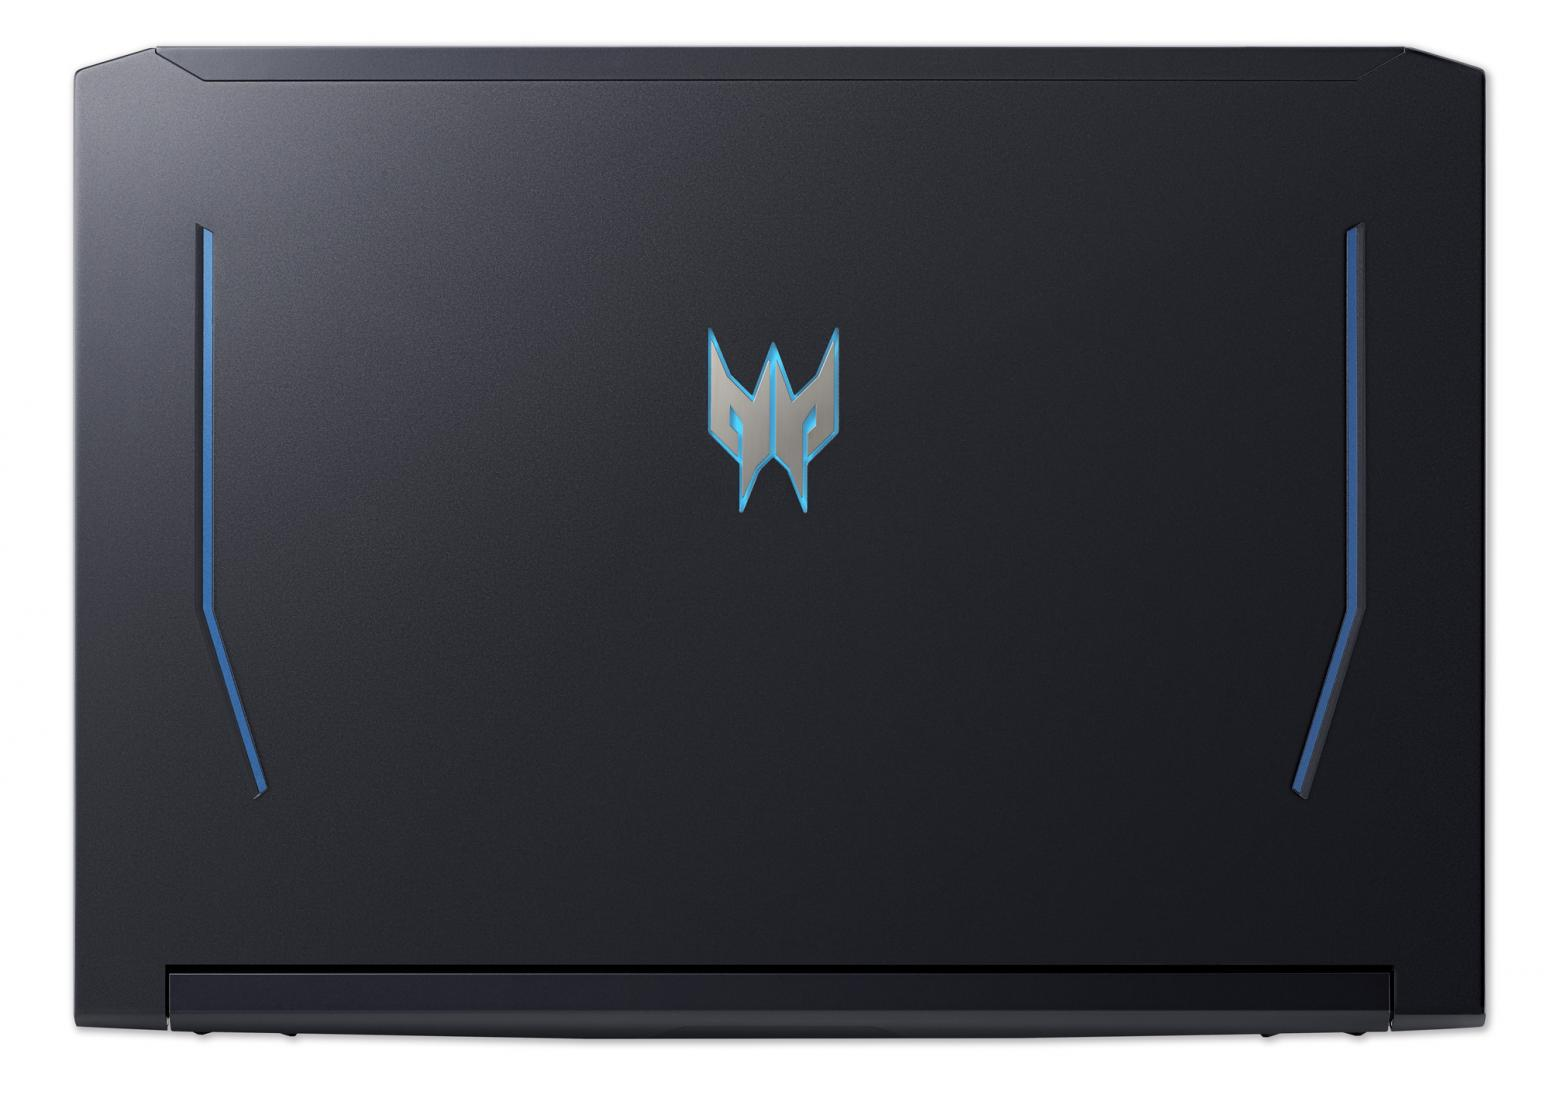 Ordinateur portable Acer Predator Helios 300 PH317-54-7677 - RTX 2070 Max-Q, 144Hz - photo 7